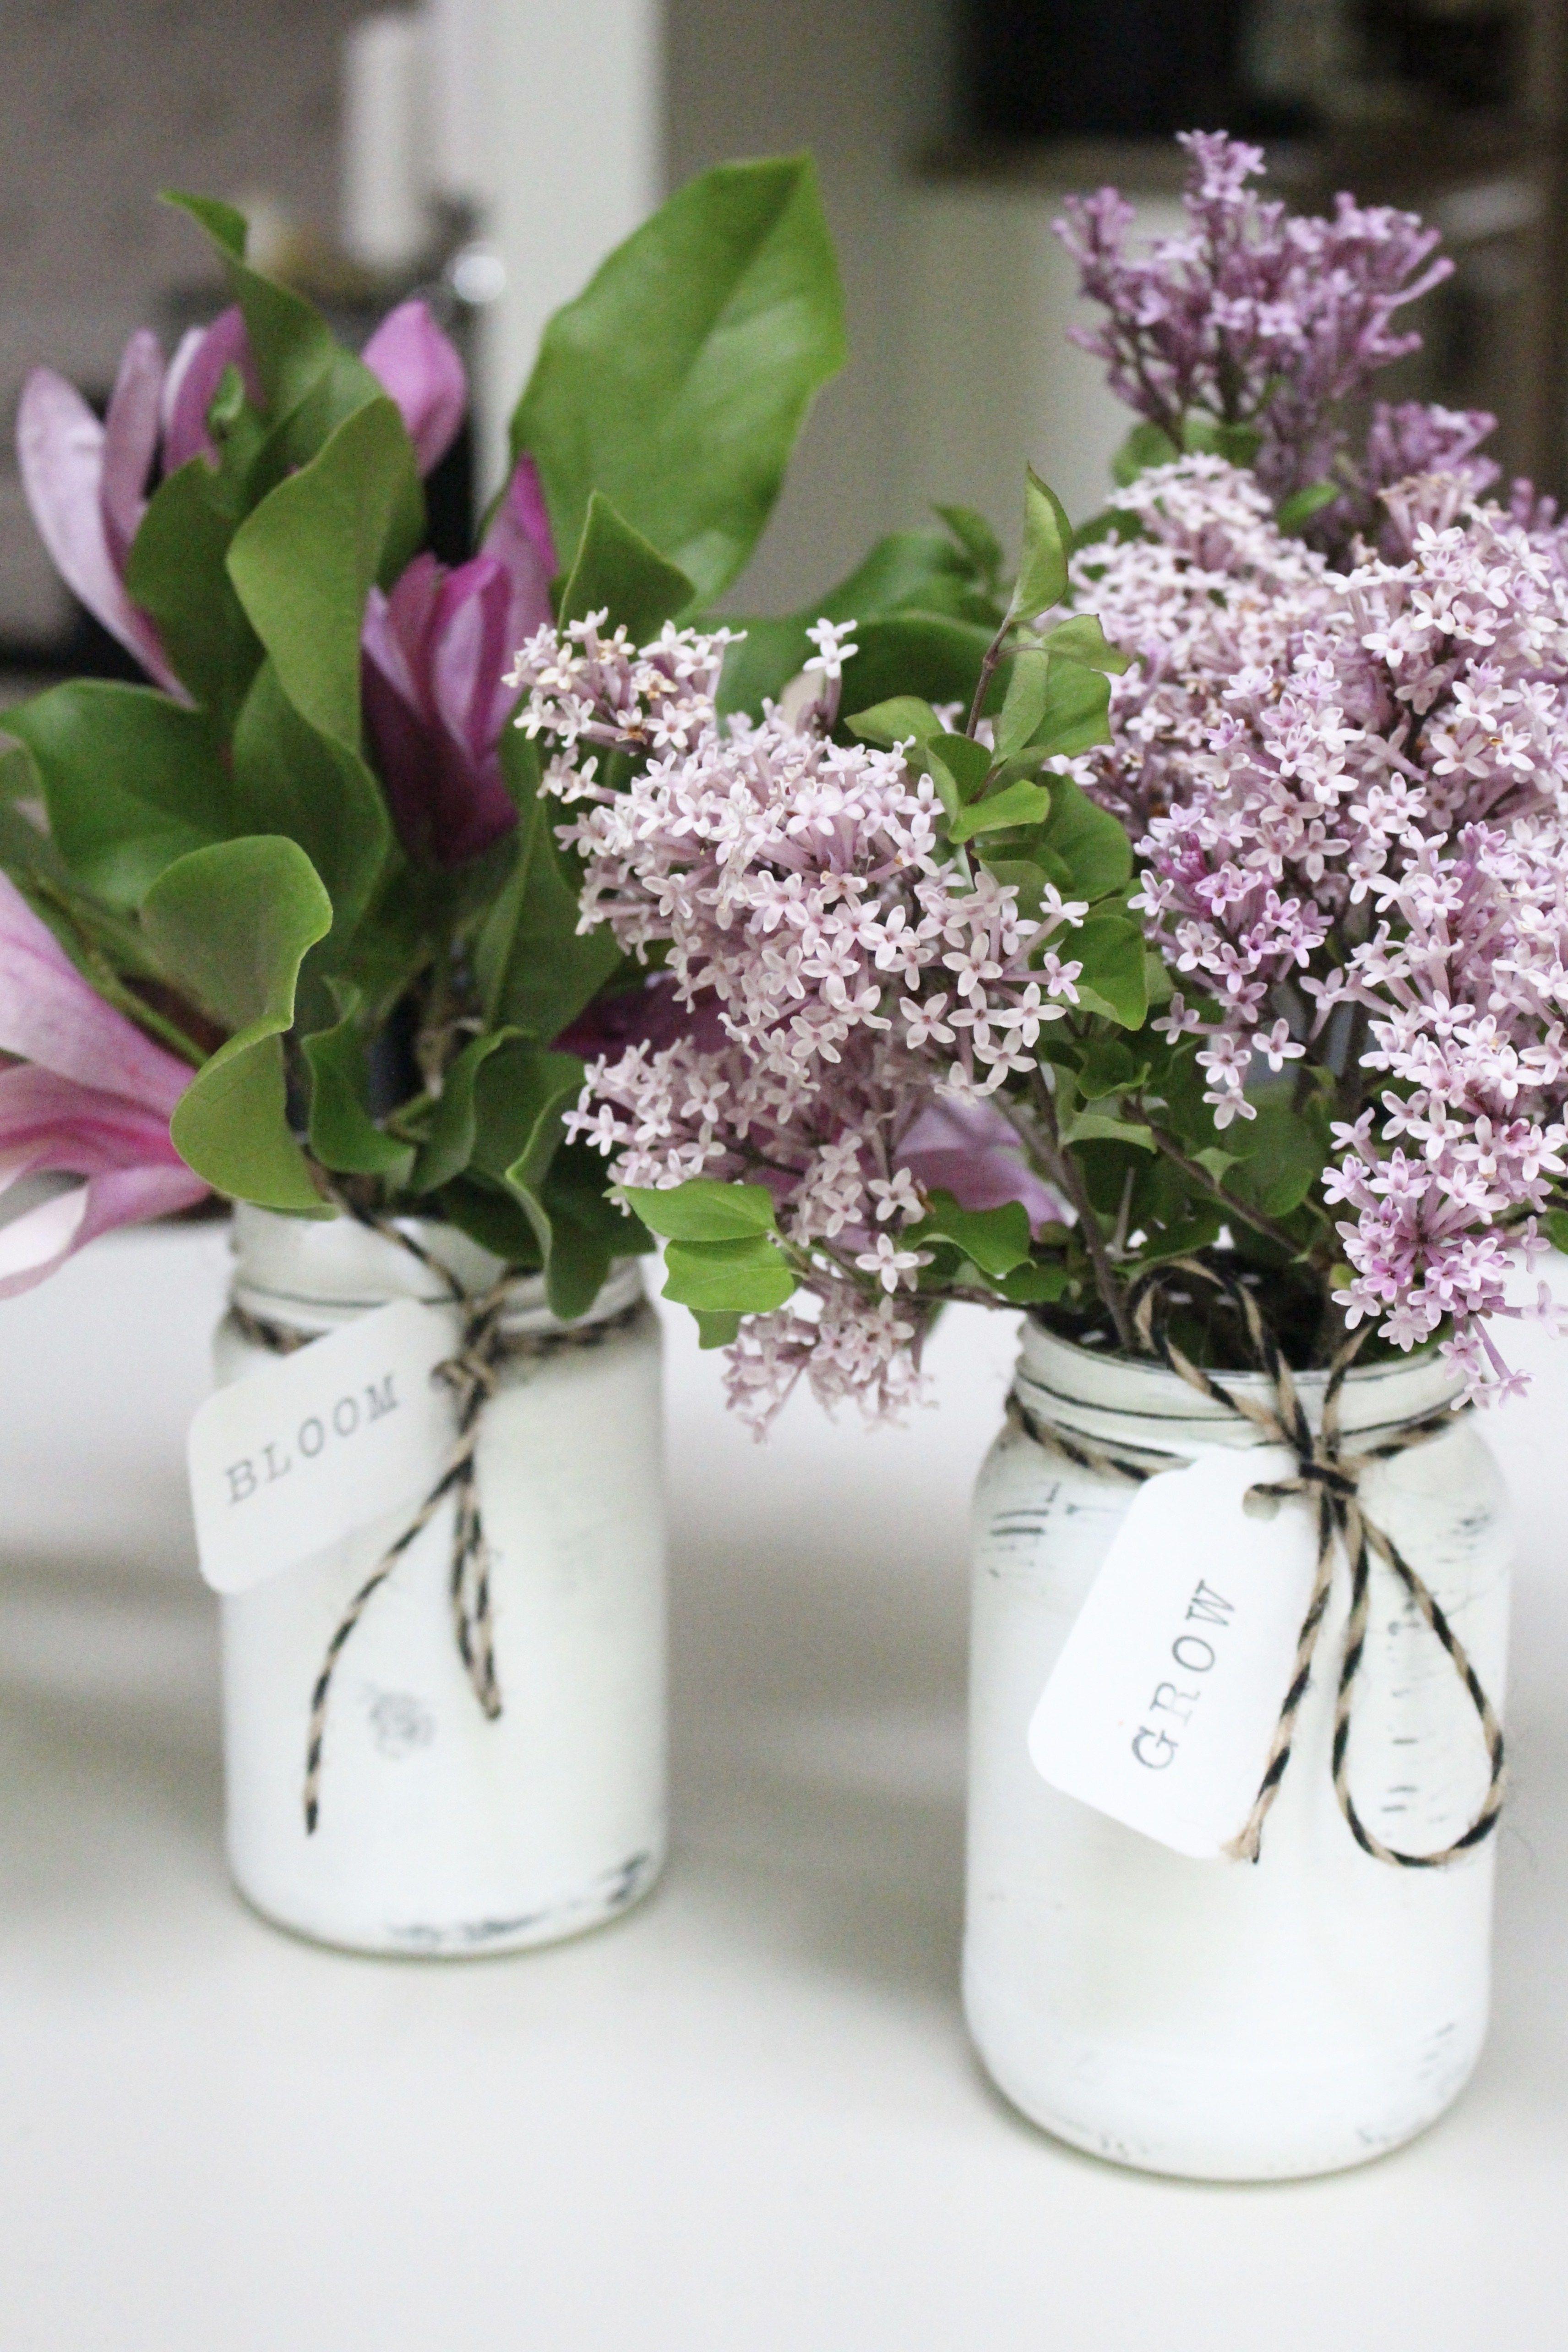 Flower Market\u201d unique gift for floral arranging Chalkboard Black with Hand Lettering Farmhouse Bottle Vases with Jute Bow